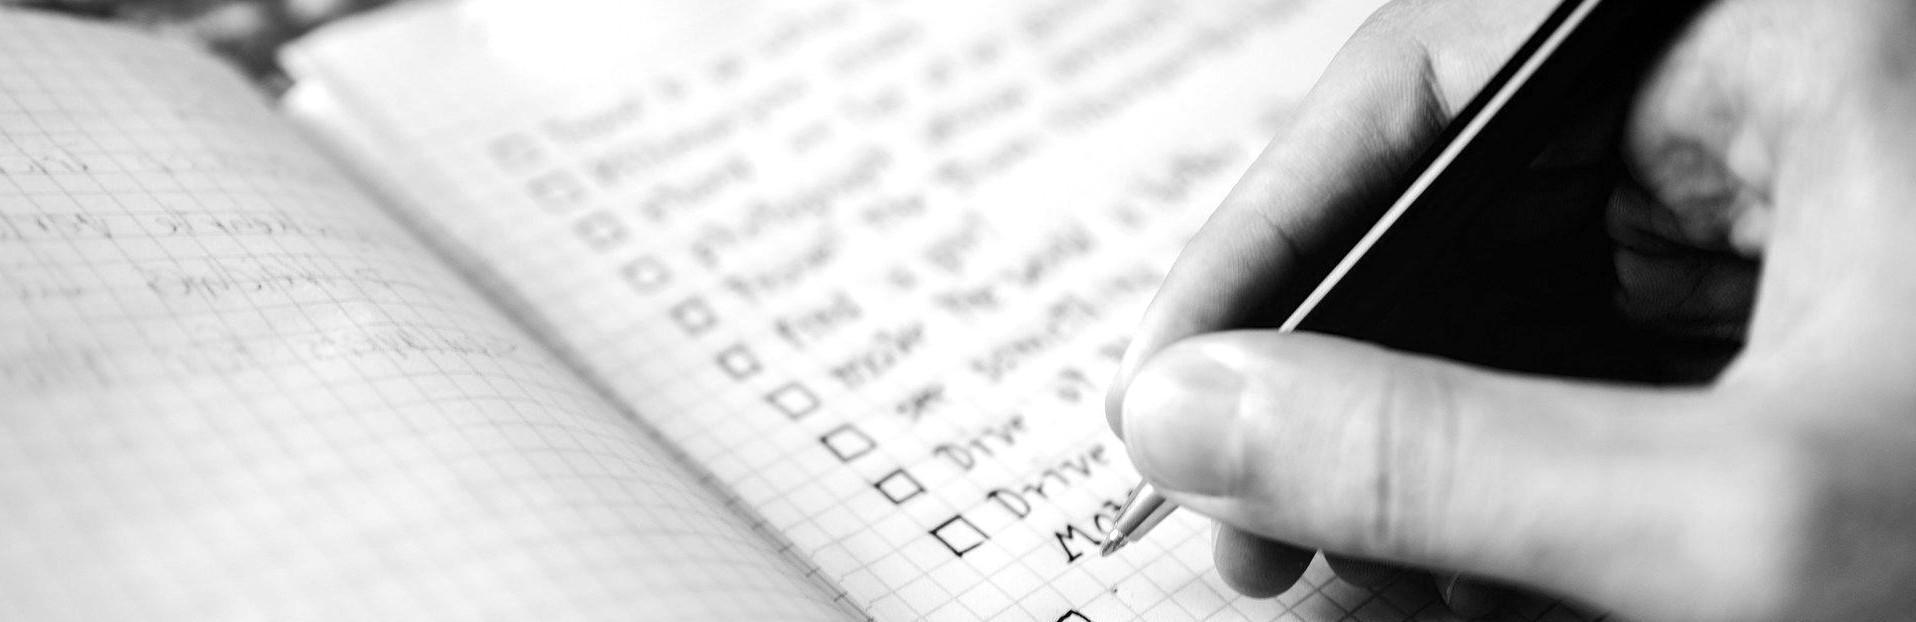 SEO Audit Feature - Writing checkliist